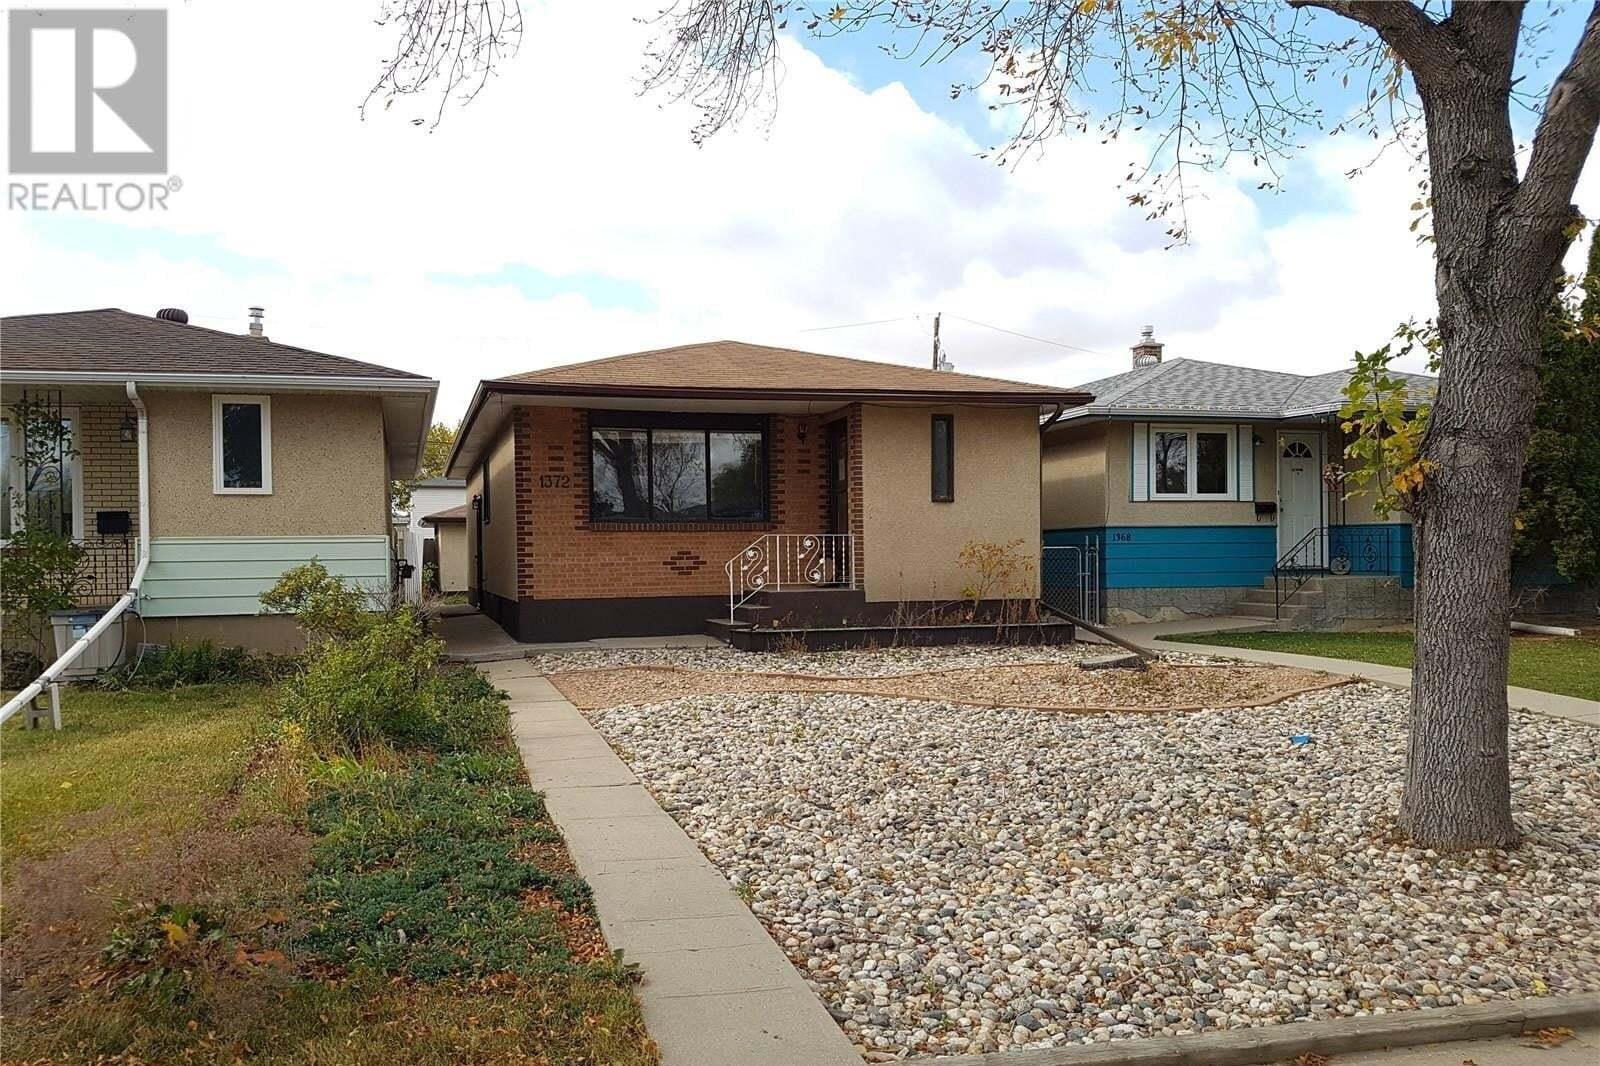 House for sale at 1372 Rupert St Regina Saskatchewan - MLS: SK828315